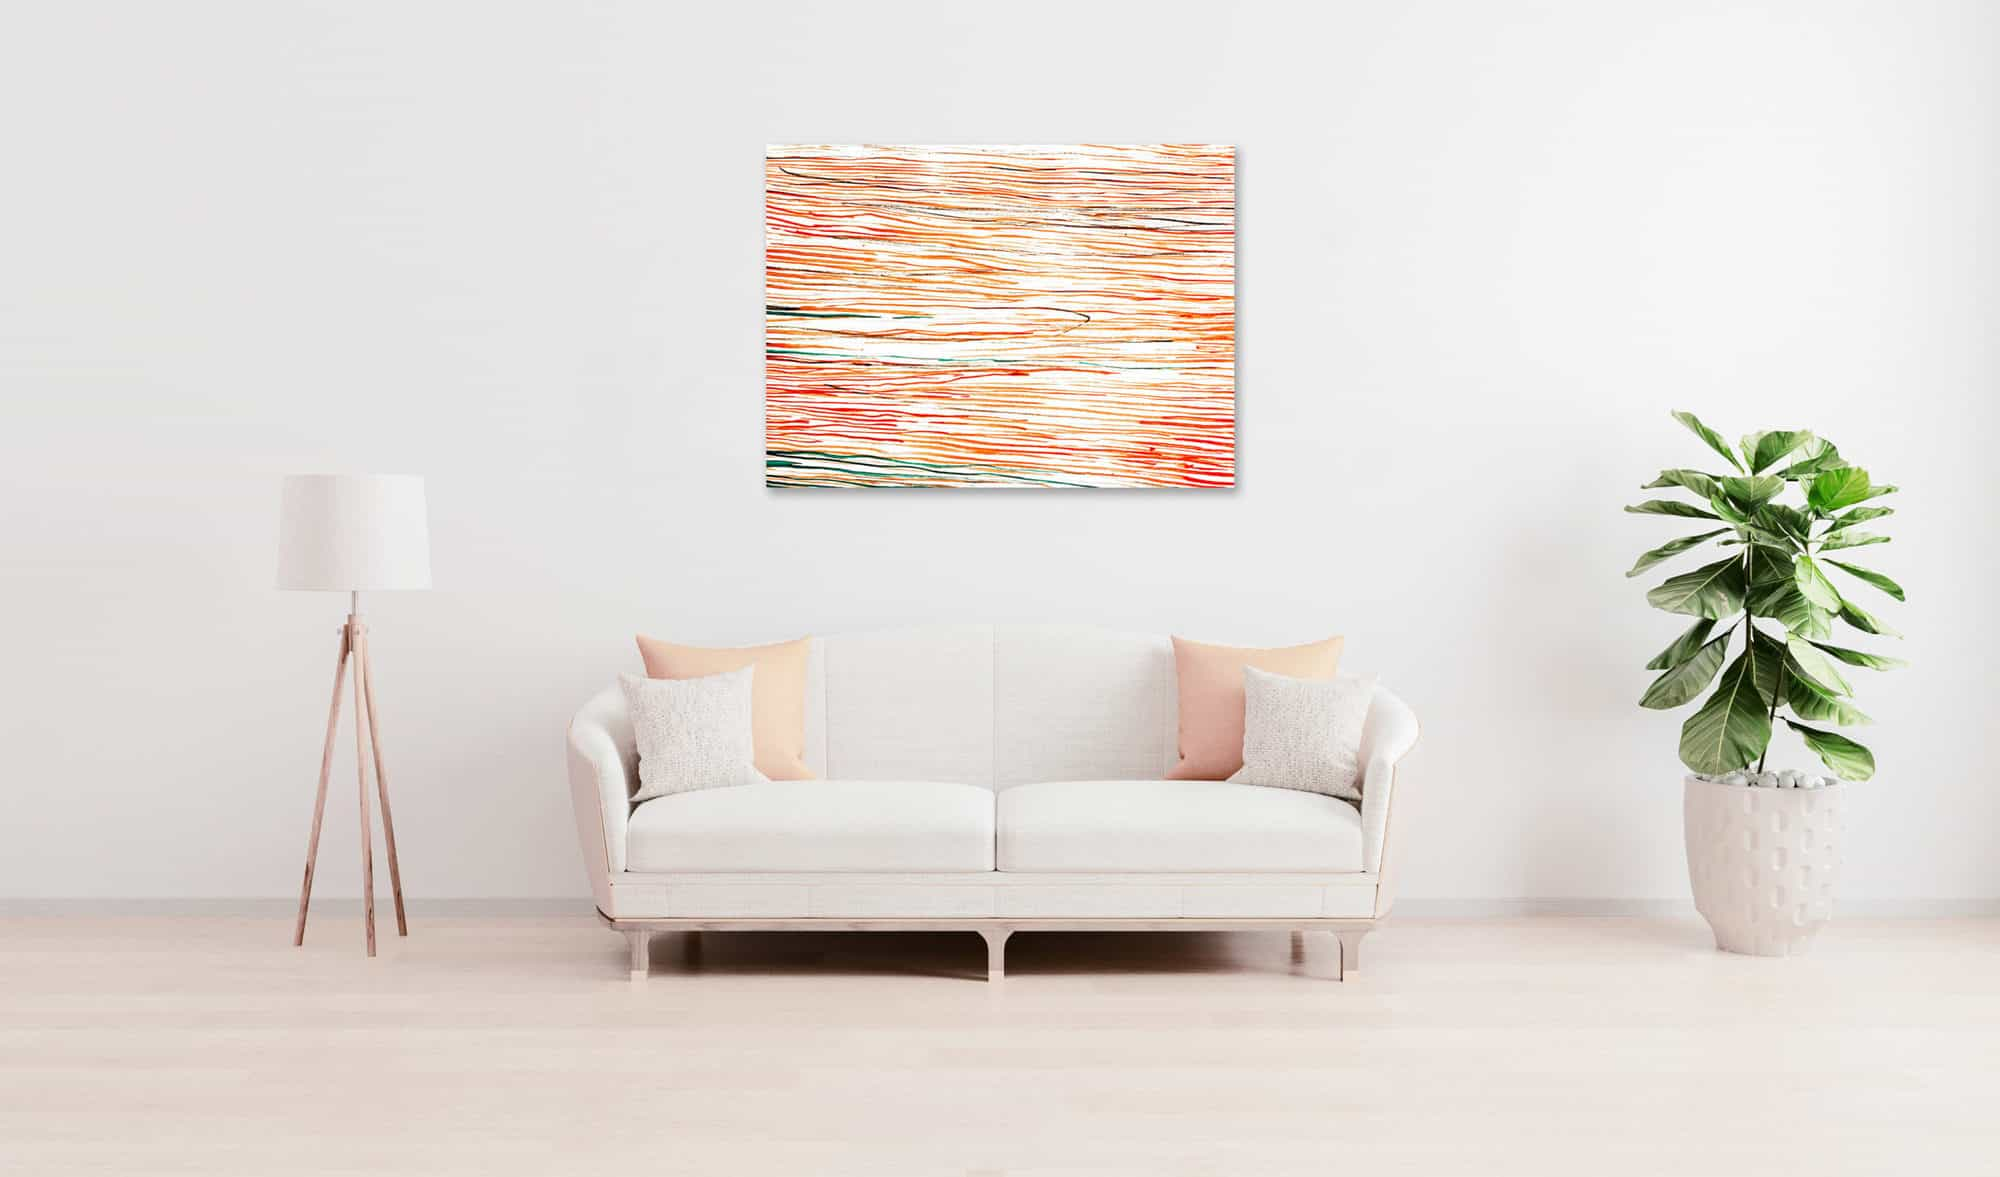 Ölgemälde auf Leinwand Rot Orange Linien wandbild